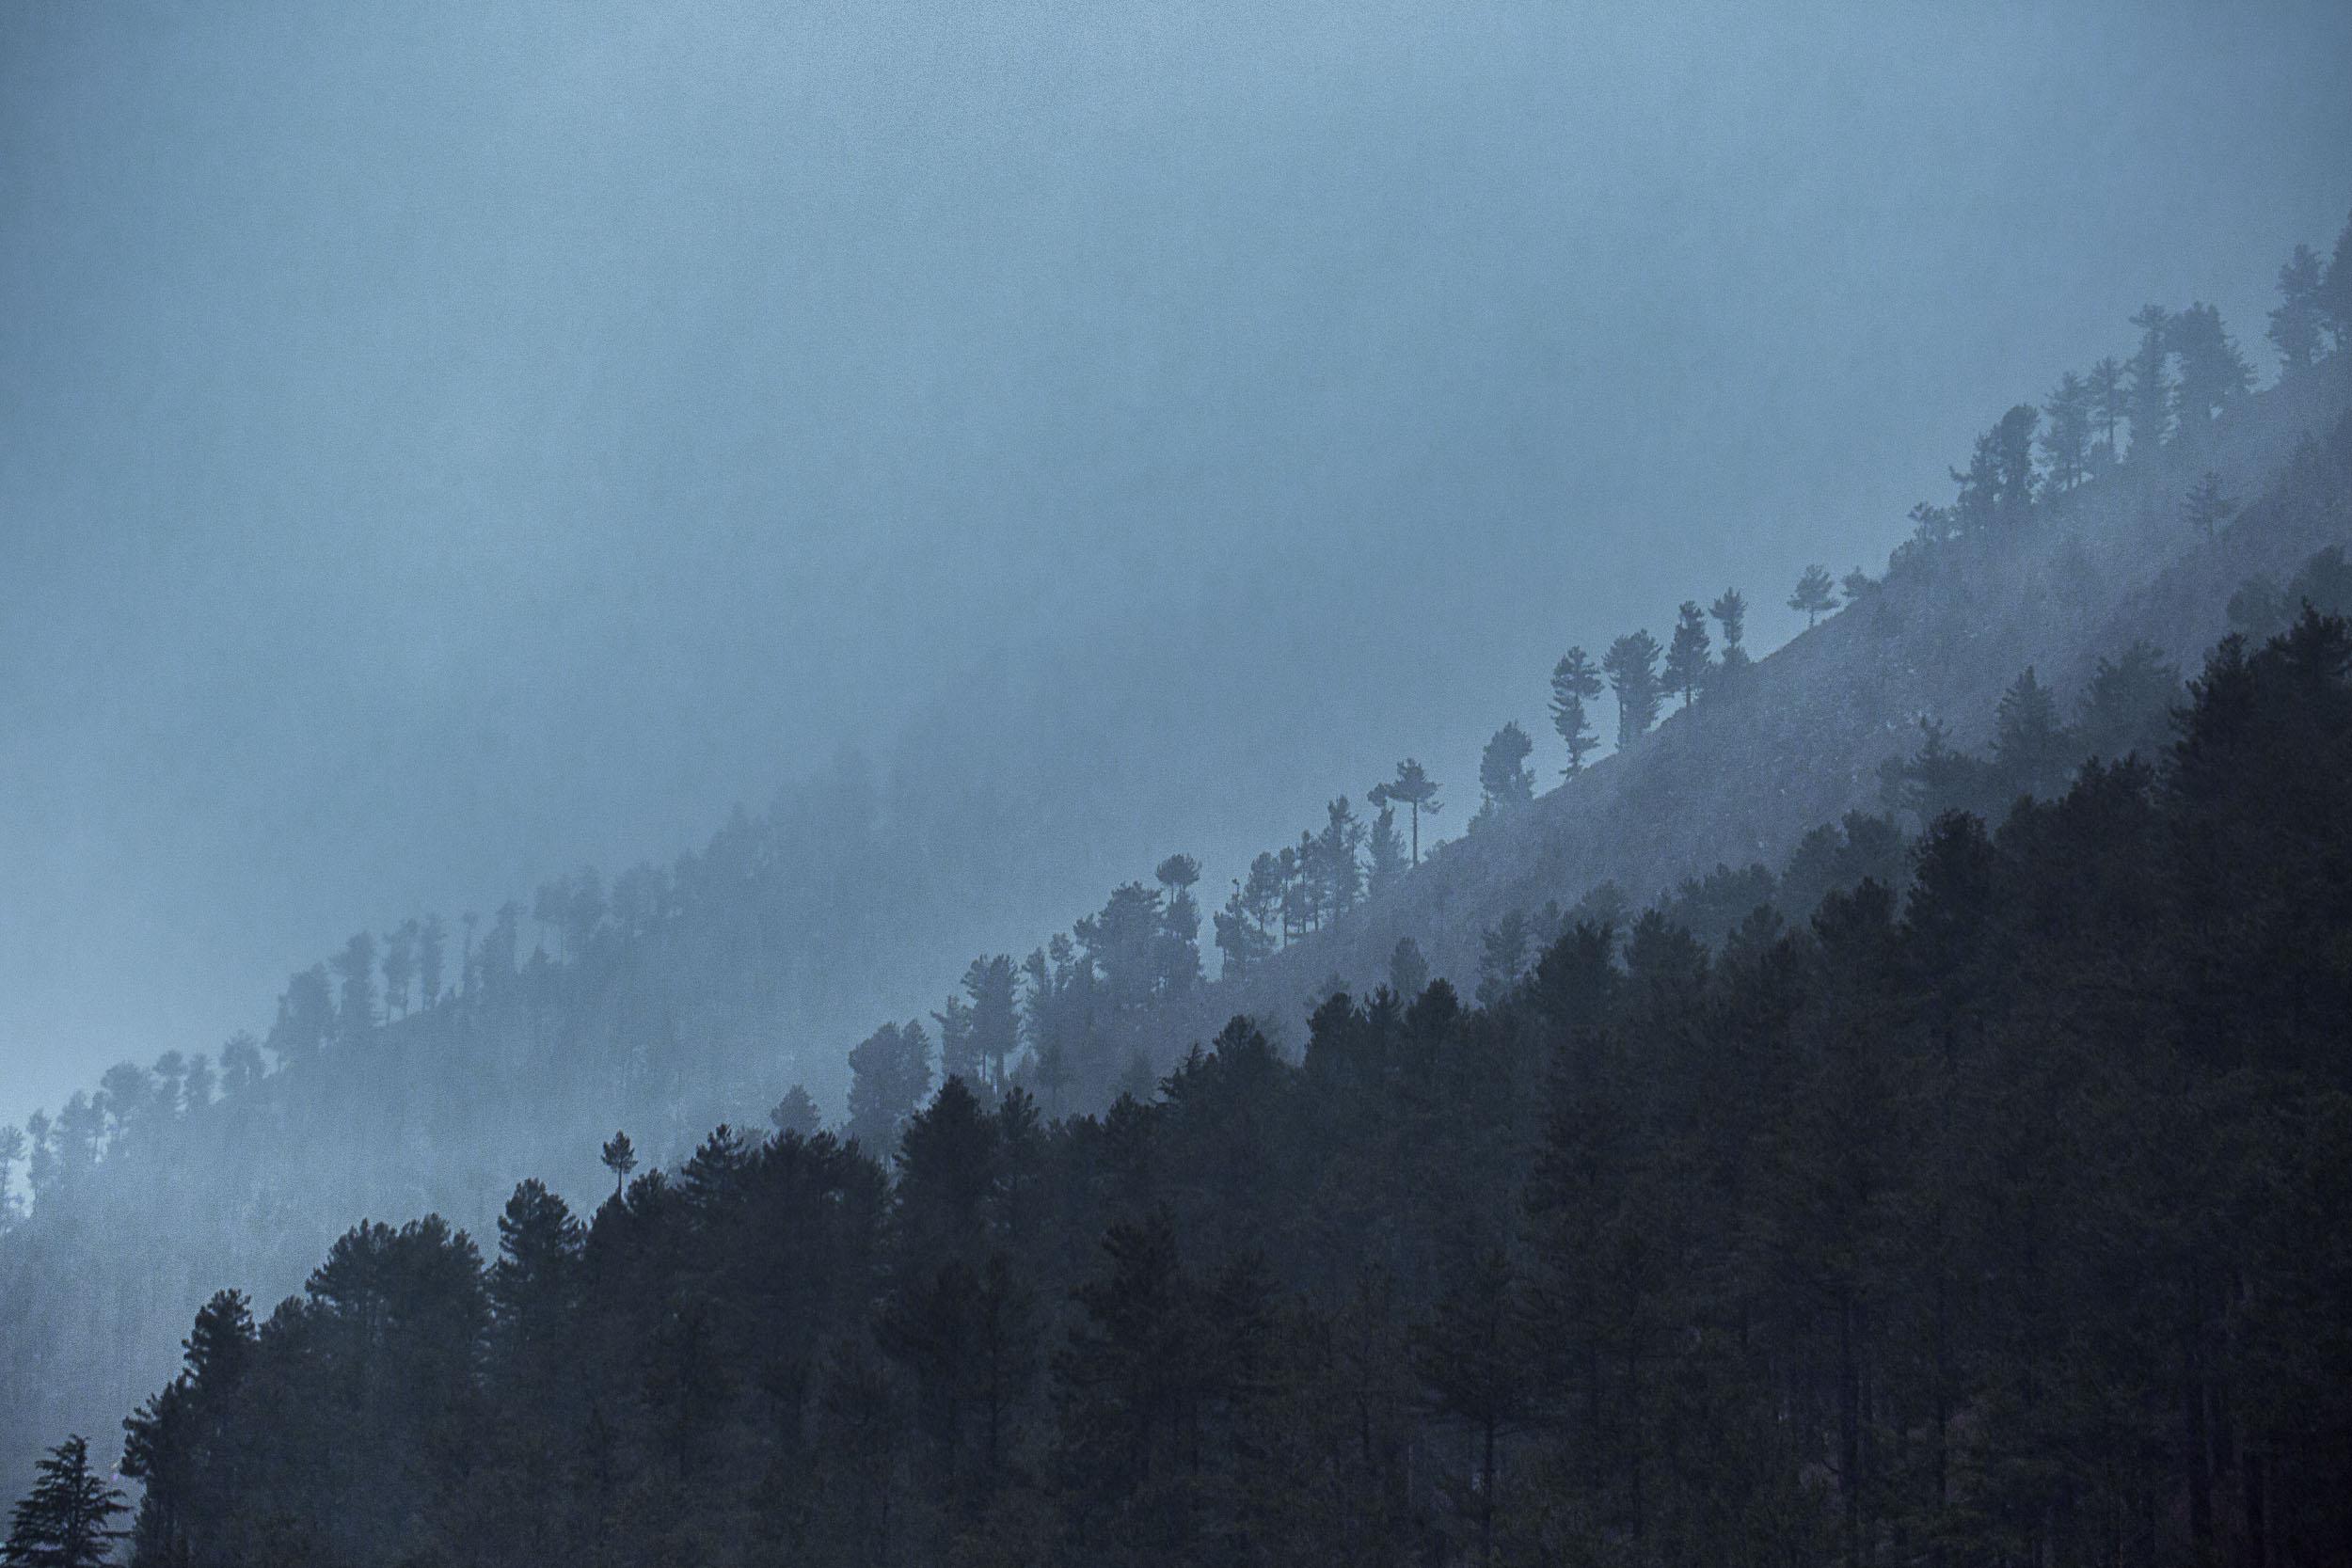 Sindhur_Photography_Travel_Nature_Kashmir-15.JPG